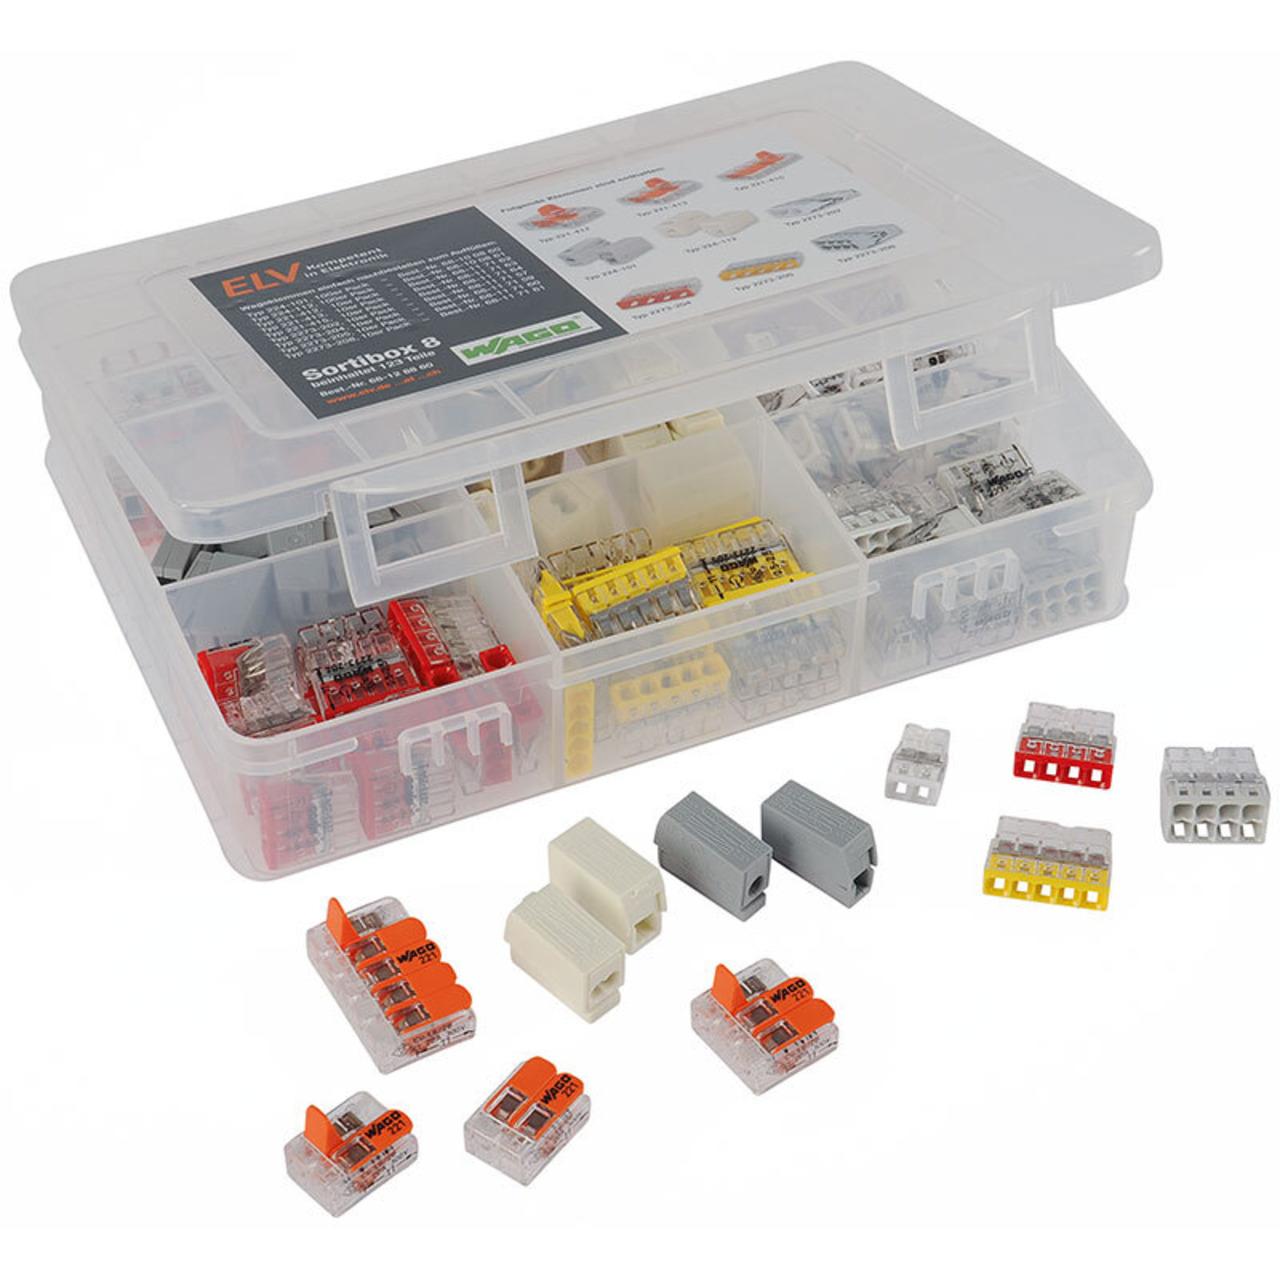 ELV Wago-Sortimentsbox Nr- 8 mit 123 Wago-Klemmen